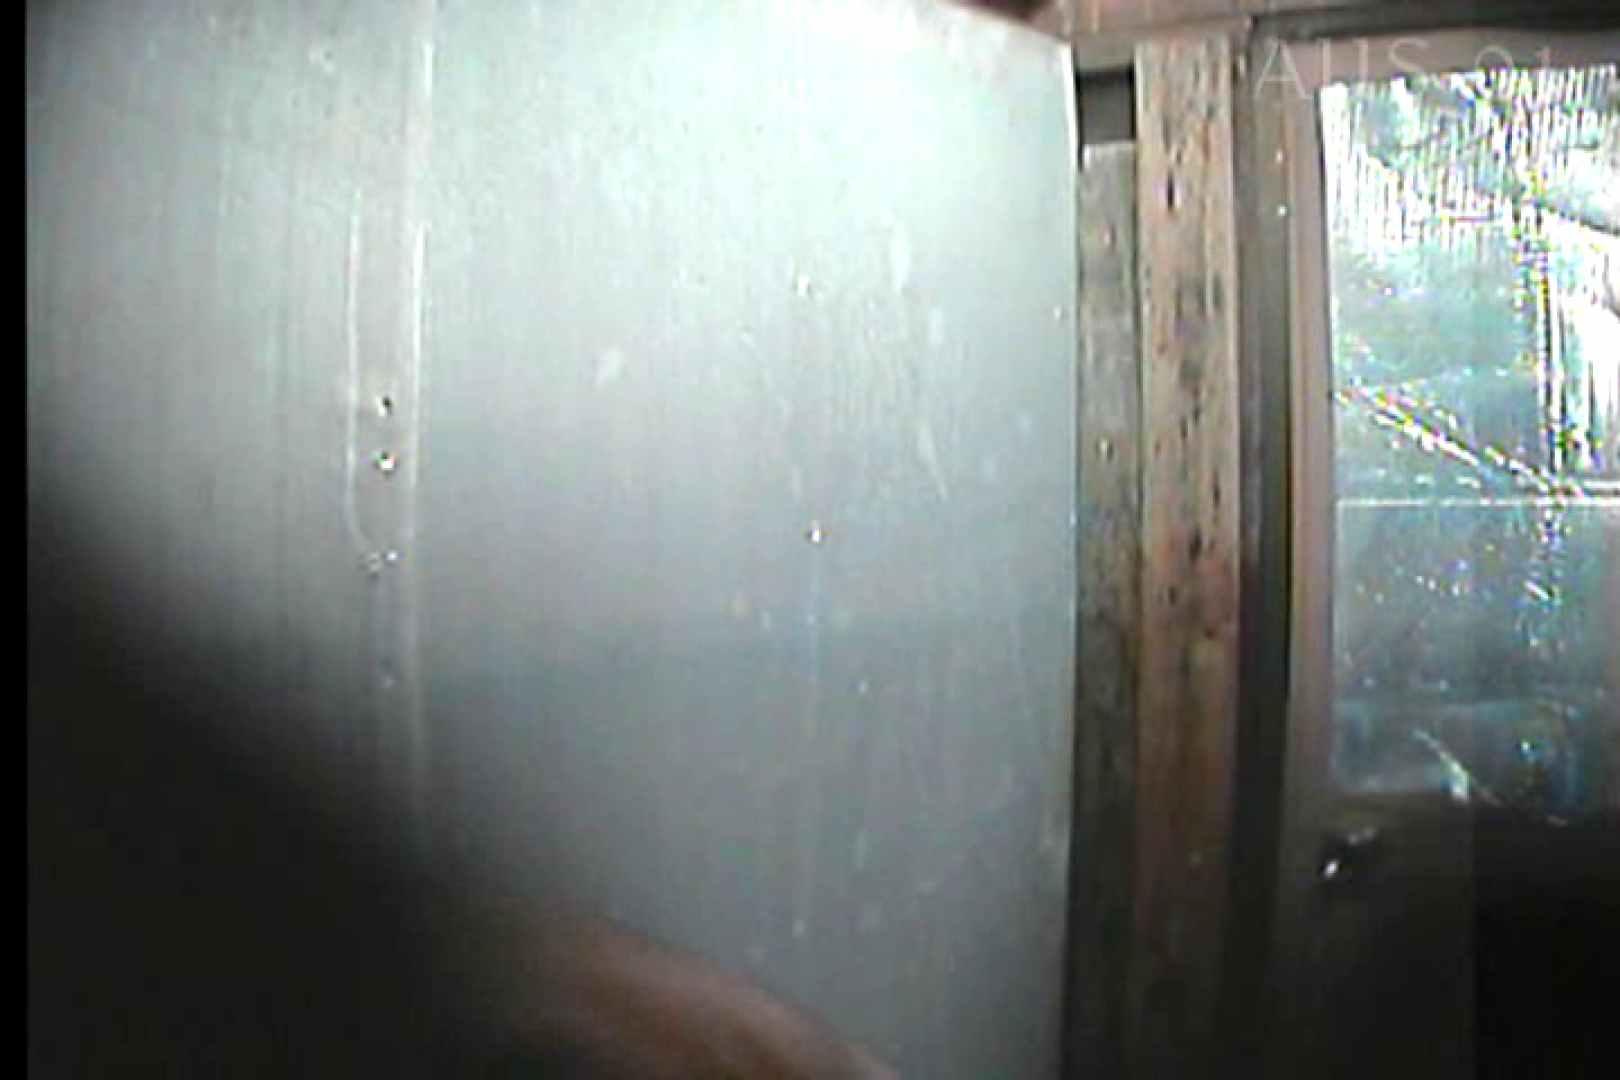 露天風呂脱衣所お着替え盗撮 Vol.01 露天風呂の女子達 | 盗撮・必見  40画像 37